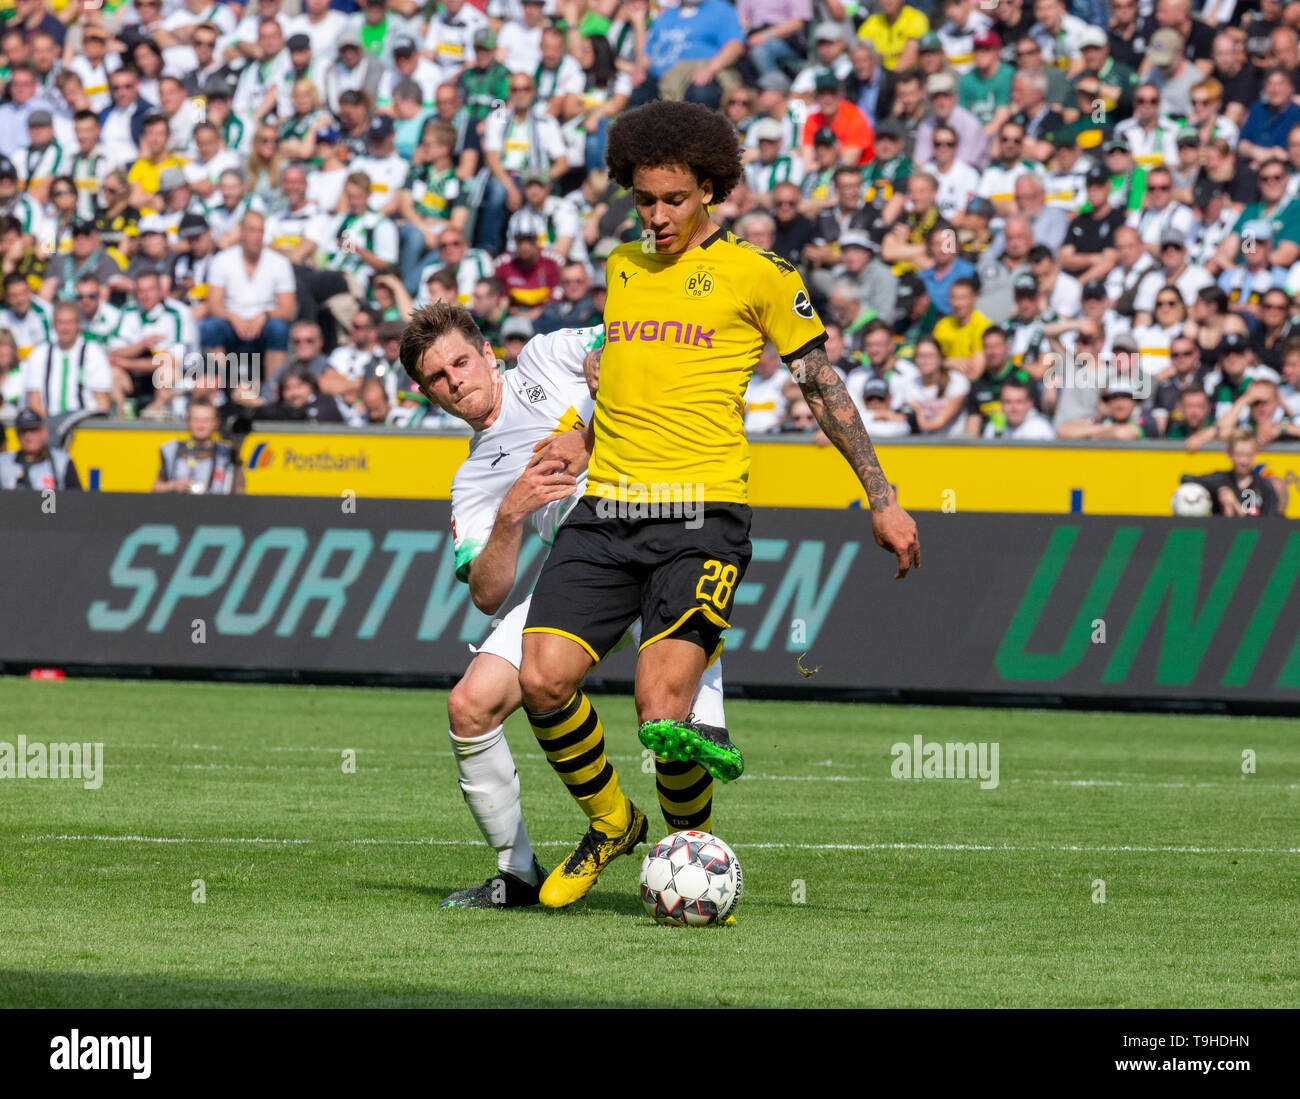 sports, football, Bundesliga, 2018/2019, Borussia Moenchengladbach vs. BVB Borussia Dortmund 0-2, Stadium Borussia Park, scene of the match, Axel Witsel (BVB) ahead, behind Jonas Hofmann (MG), DFL REGULATIONS PROHIBIT ANY USE OF PHOTOGRAPHS AS IMAGE SEQUENCES AND/OR QUASI-VIDEO - Stock Image